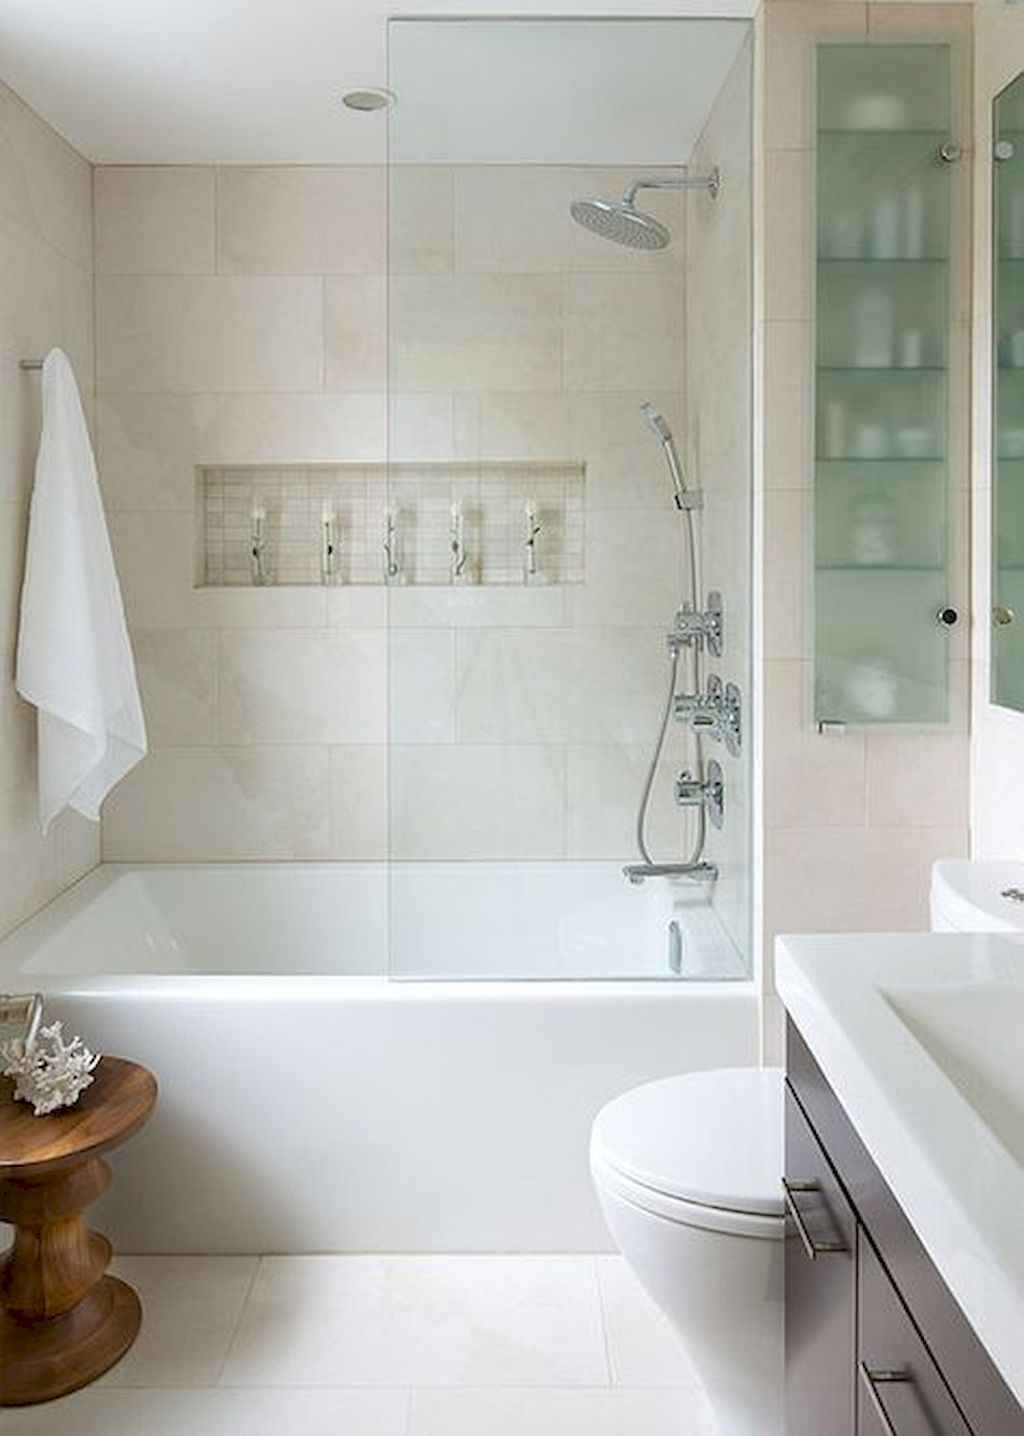 Inspiring apartment bathroom remodel ideas on a budget (11)